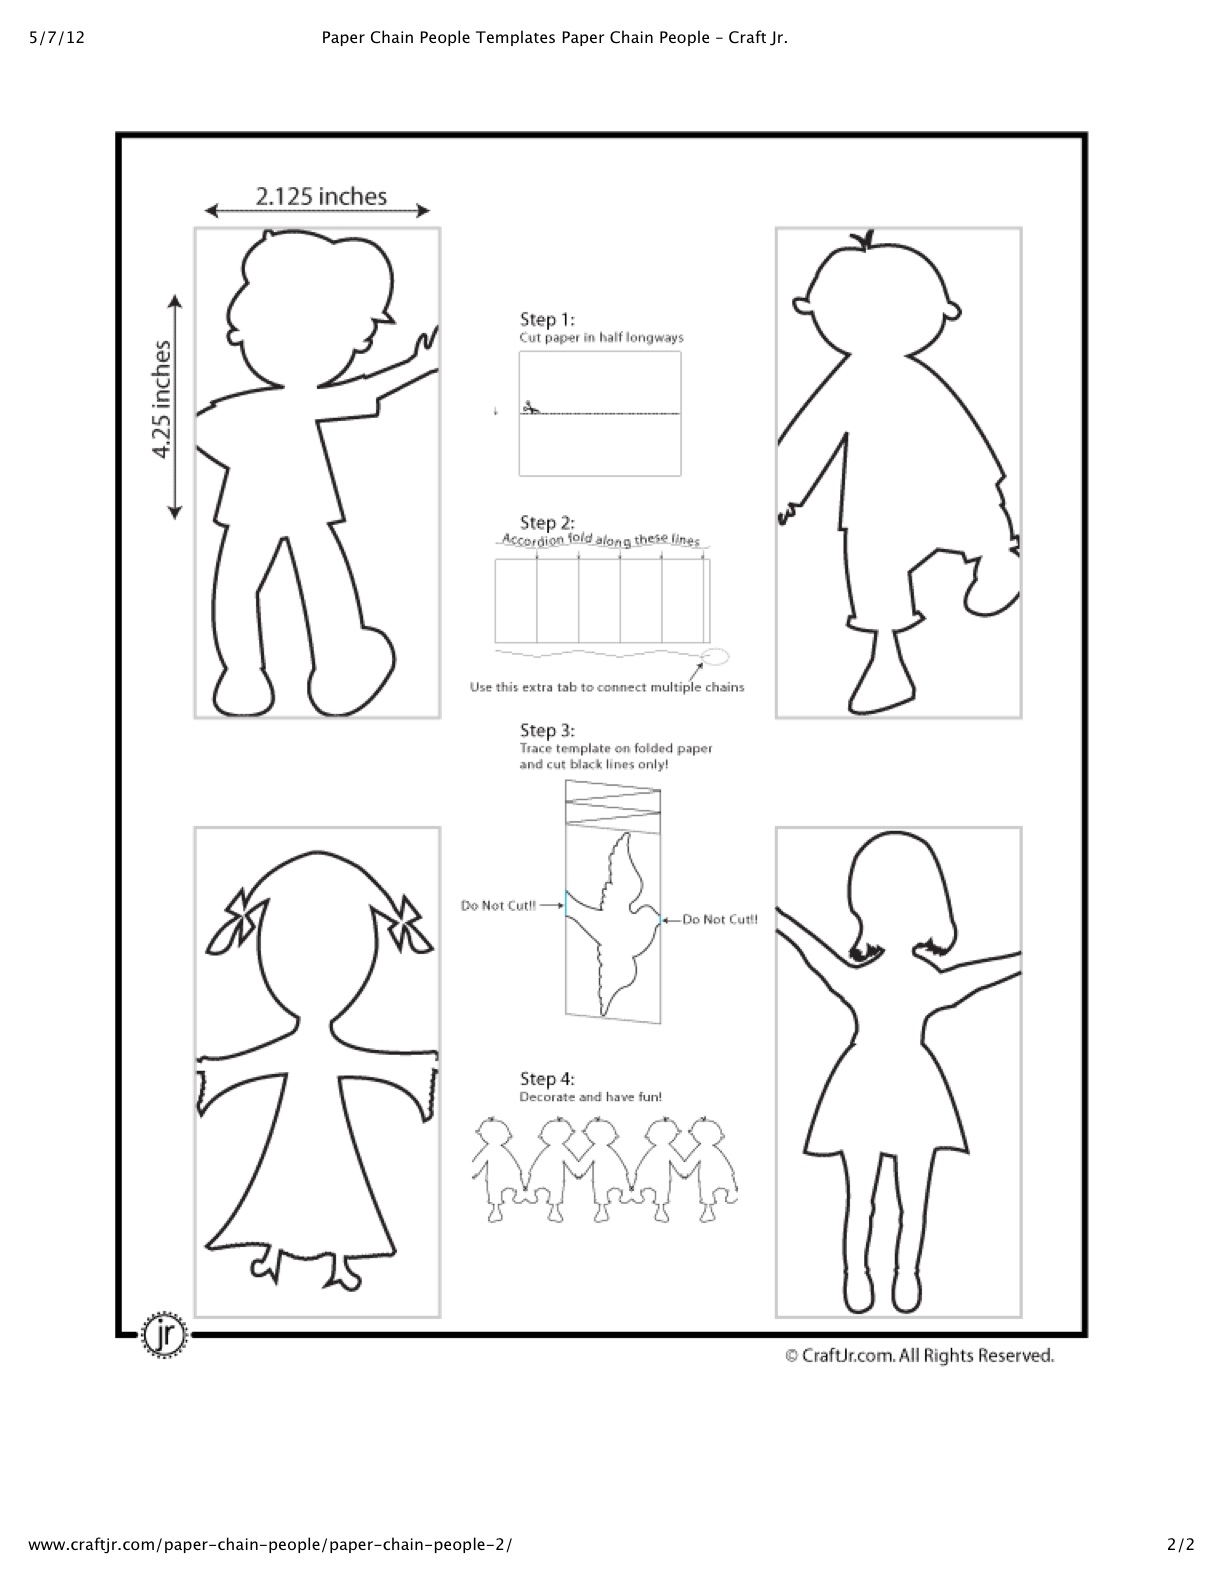 Paper Chain People | DIY Crafting Fun